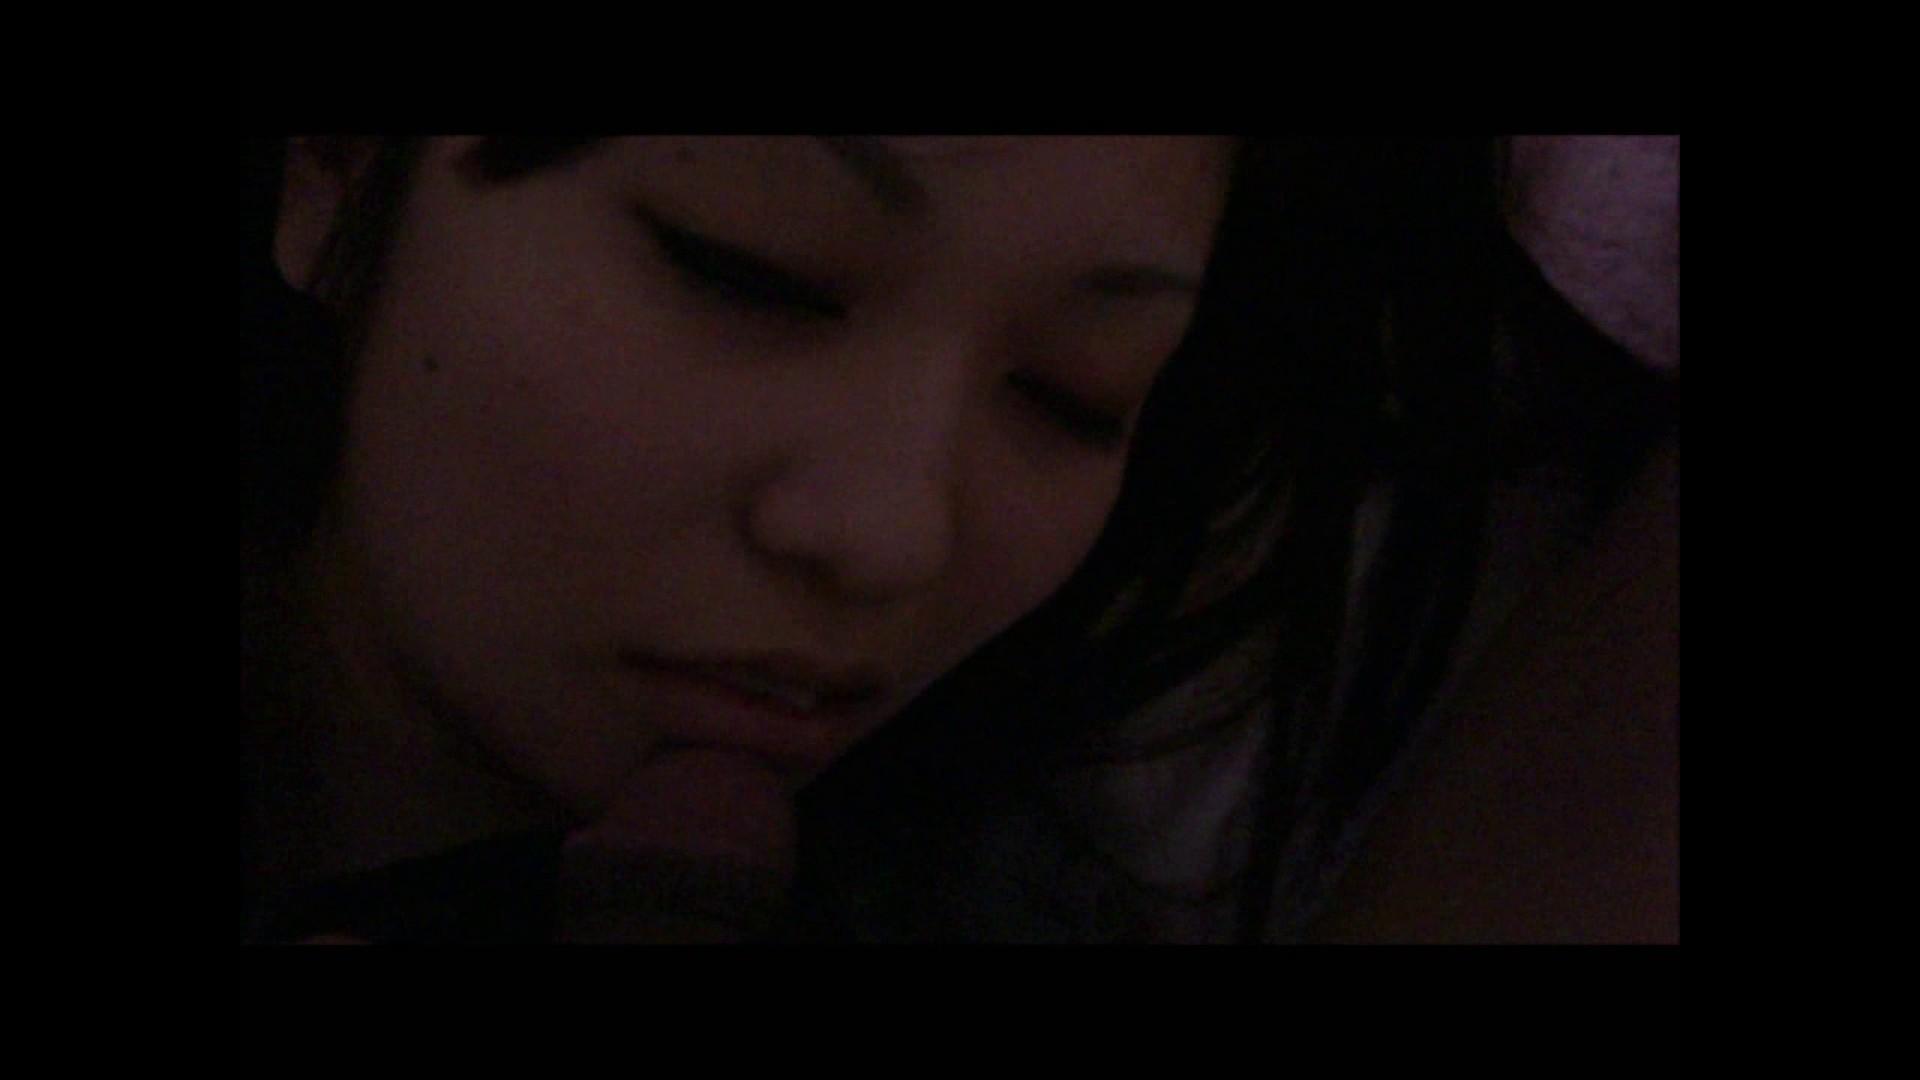 Vol.15 友人が抱く葵への感情・・・弄ばれた巨乳。 友人 アダルト動画キャプチャ 111枚 101